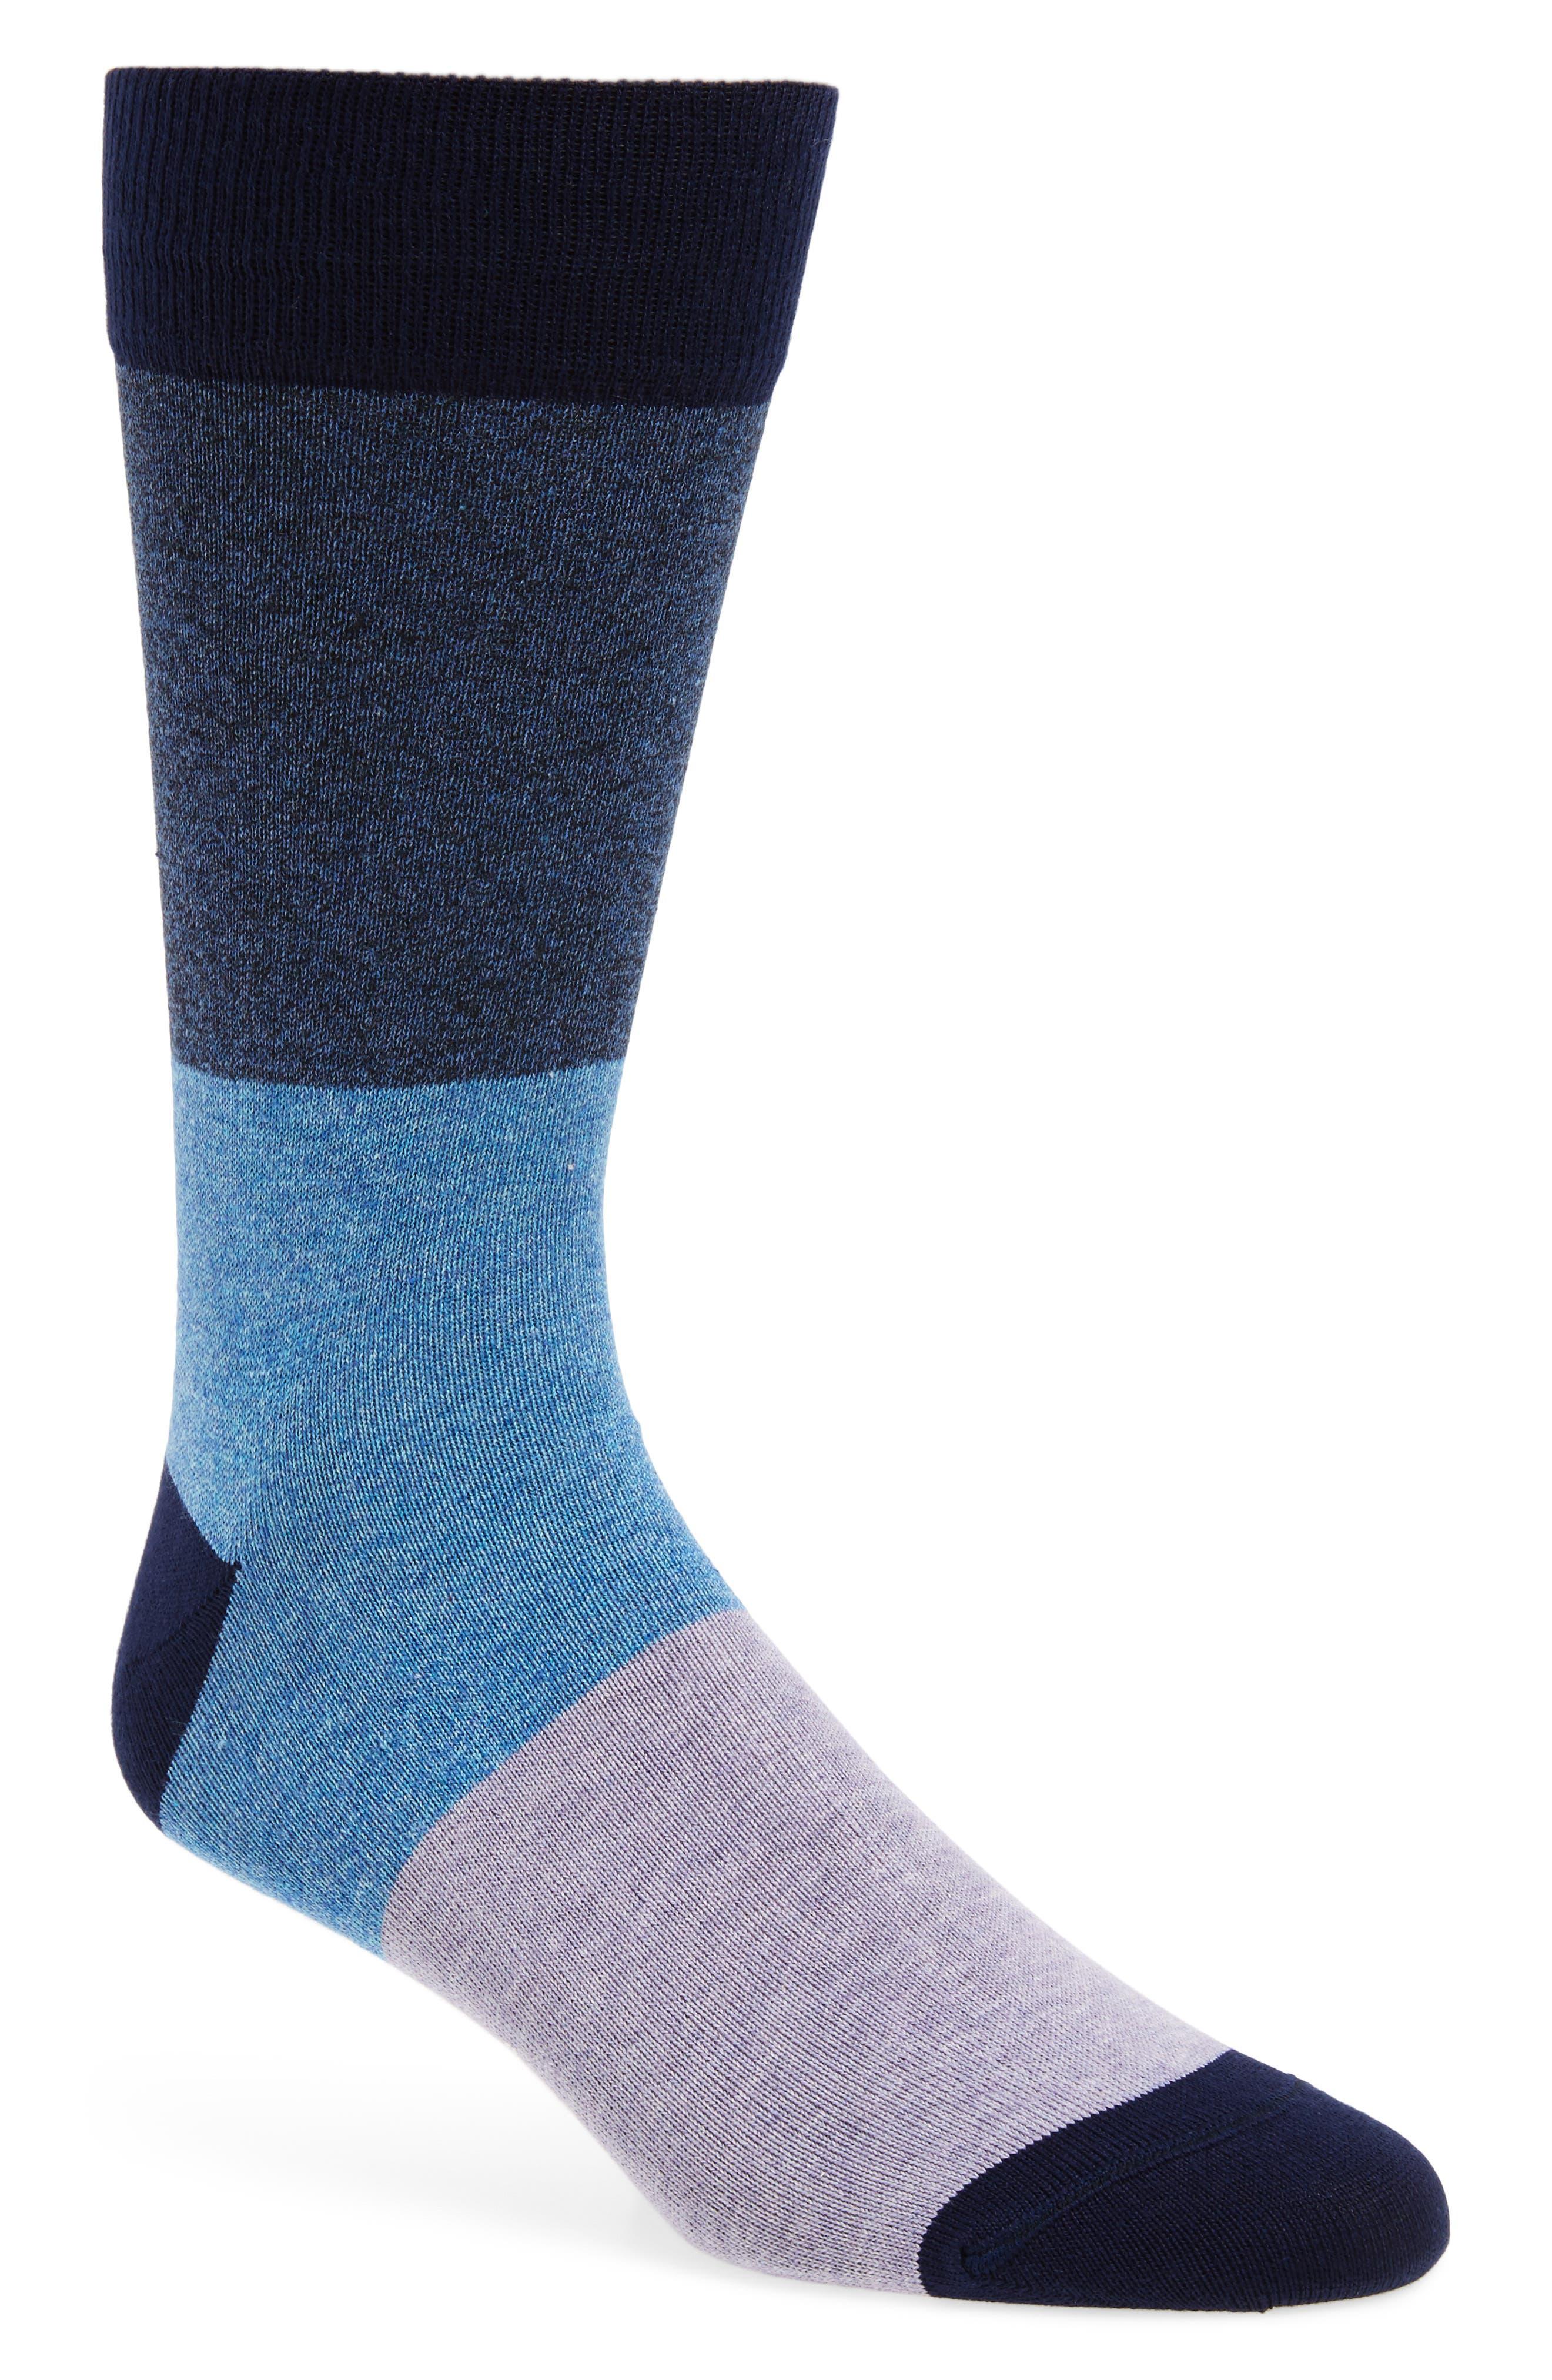 Paul Smith Colorblock Socks